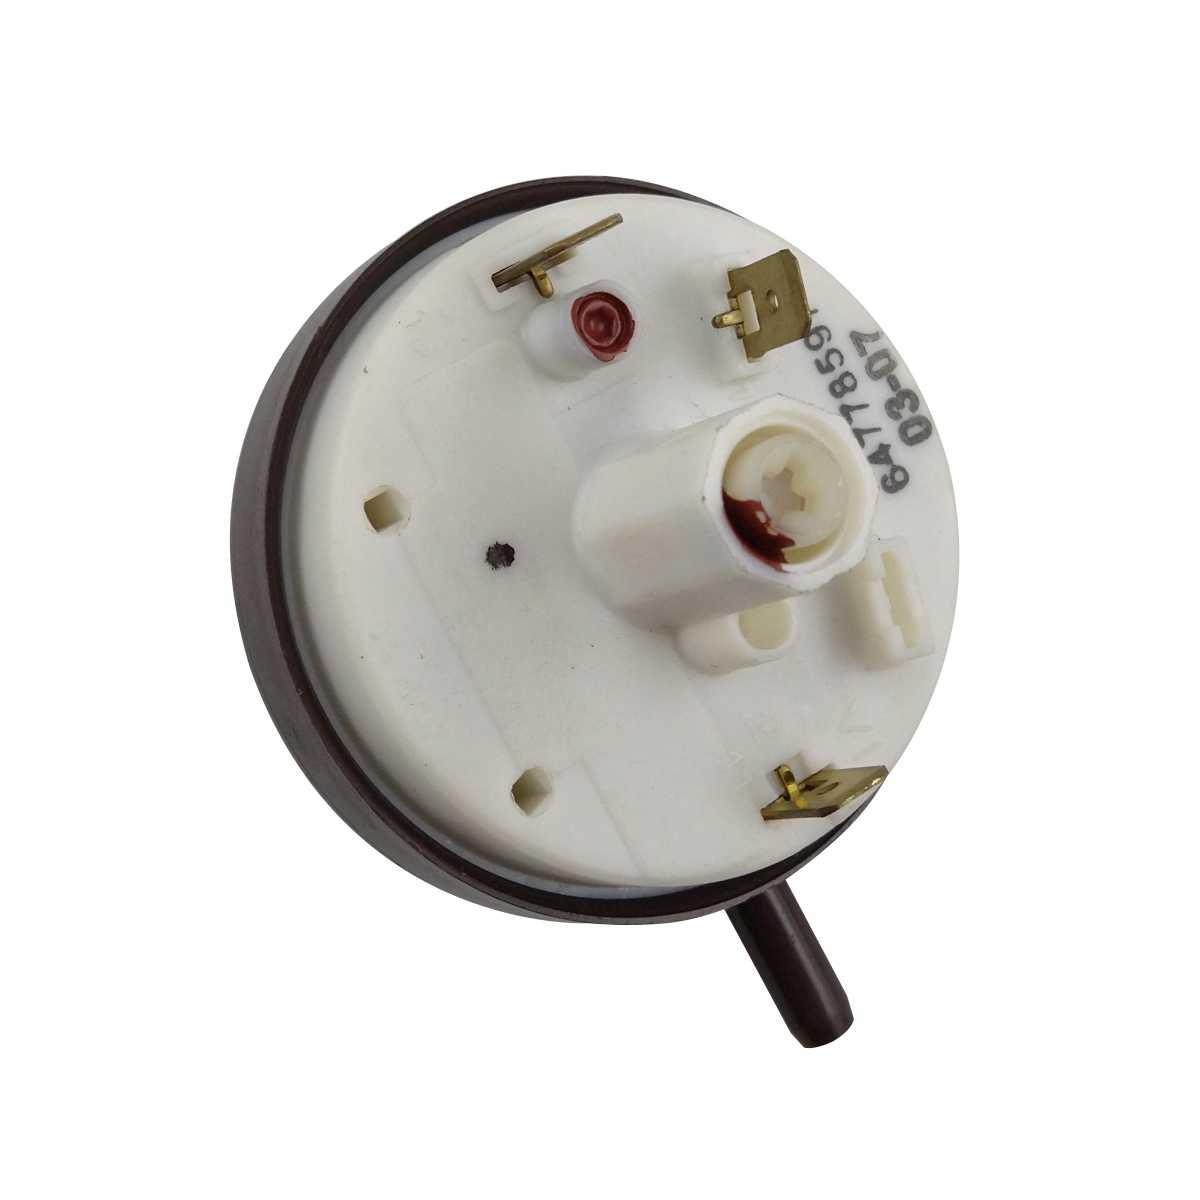 Pressostato compatível lavadora Electrolux Le05 1 nivel